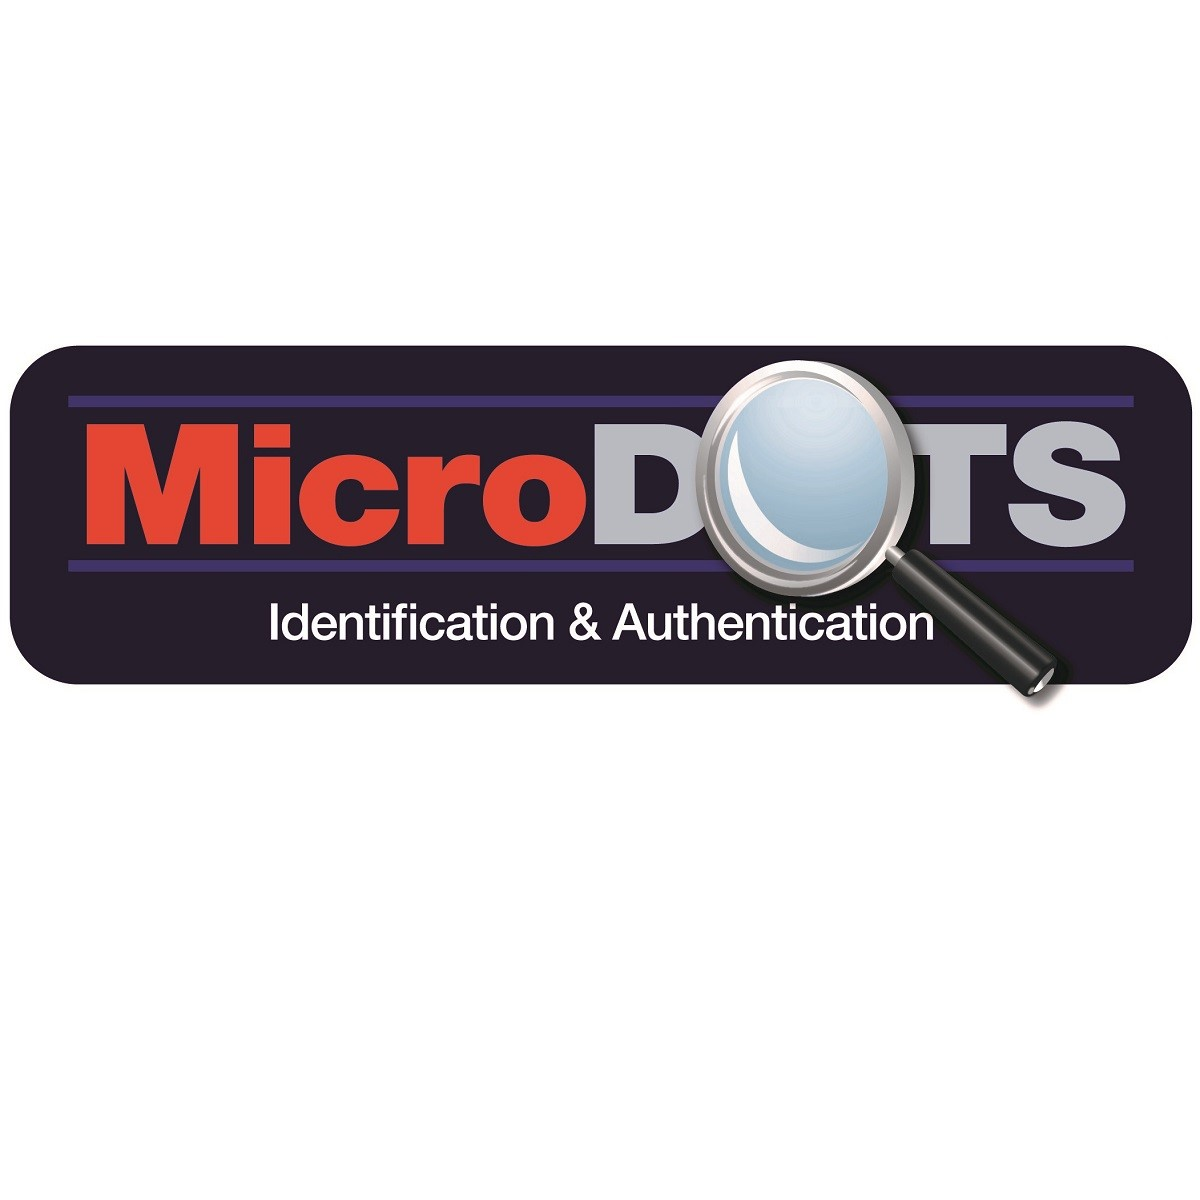 MicroDOT Australia